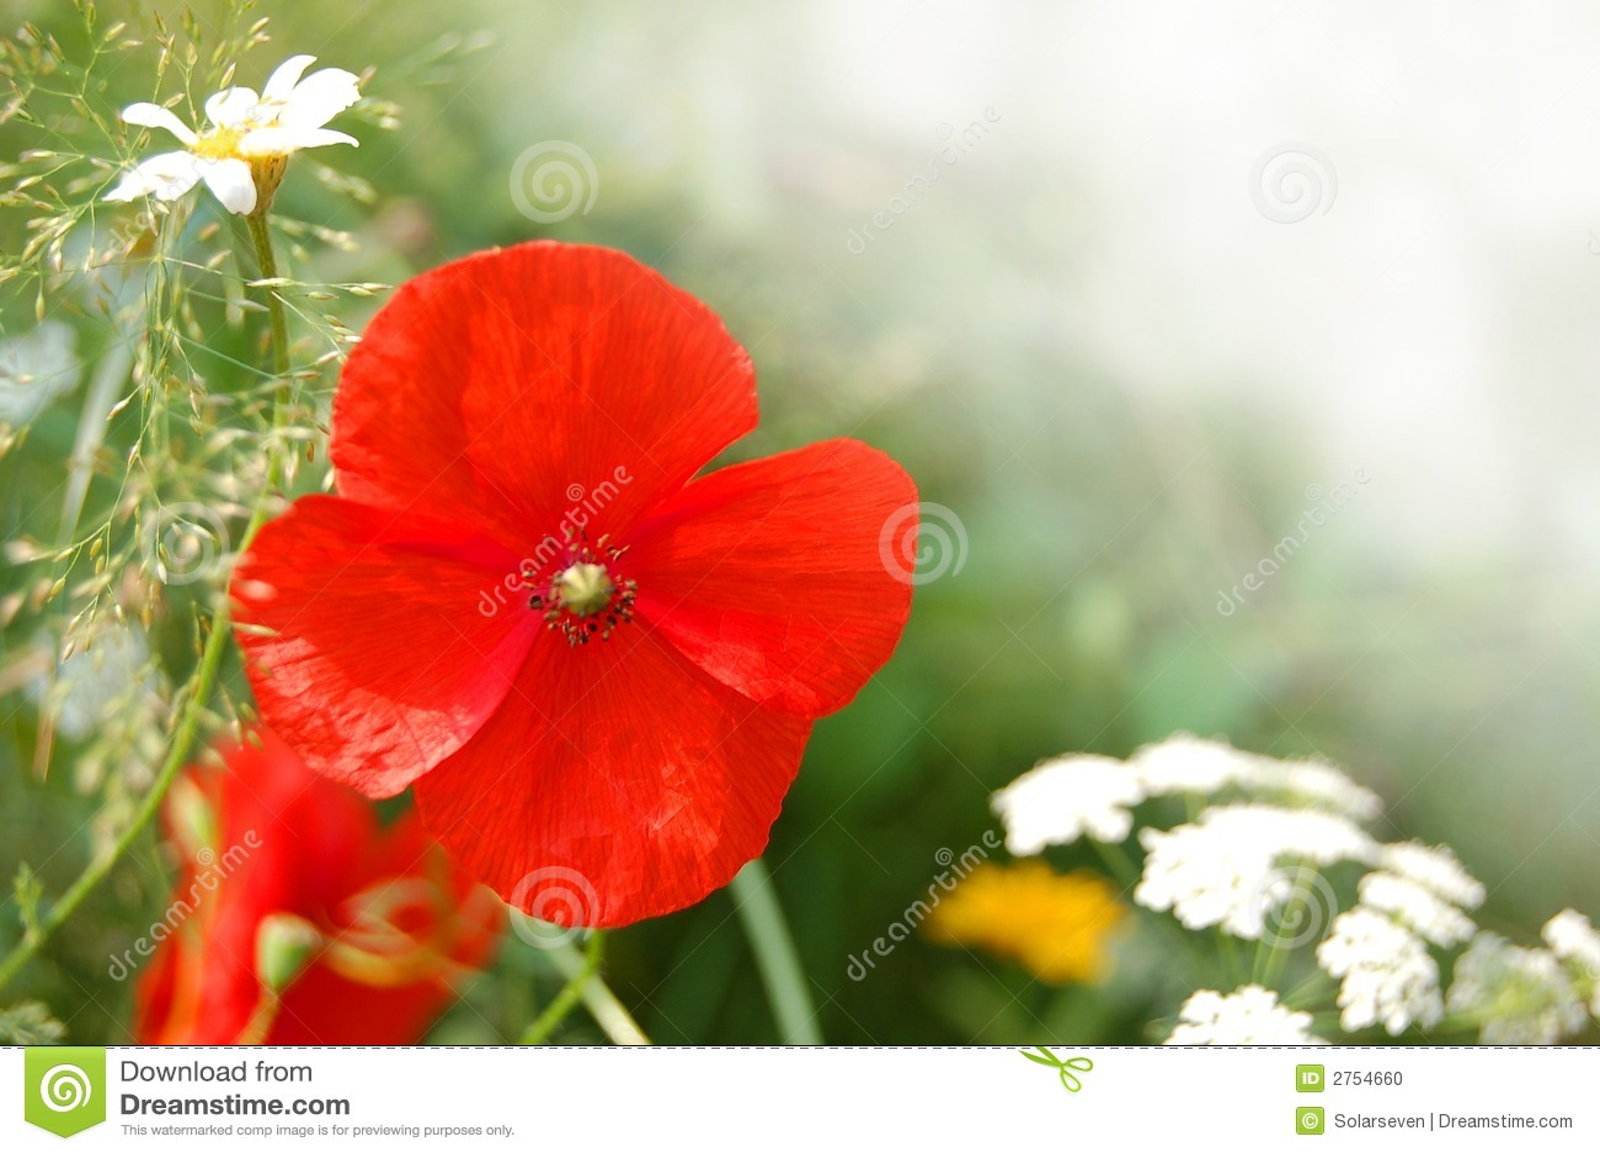 wild poppy flowers on - photo #6